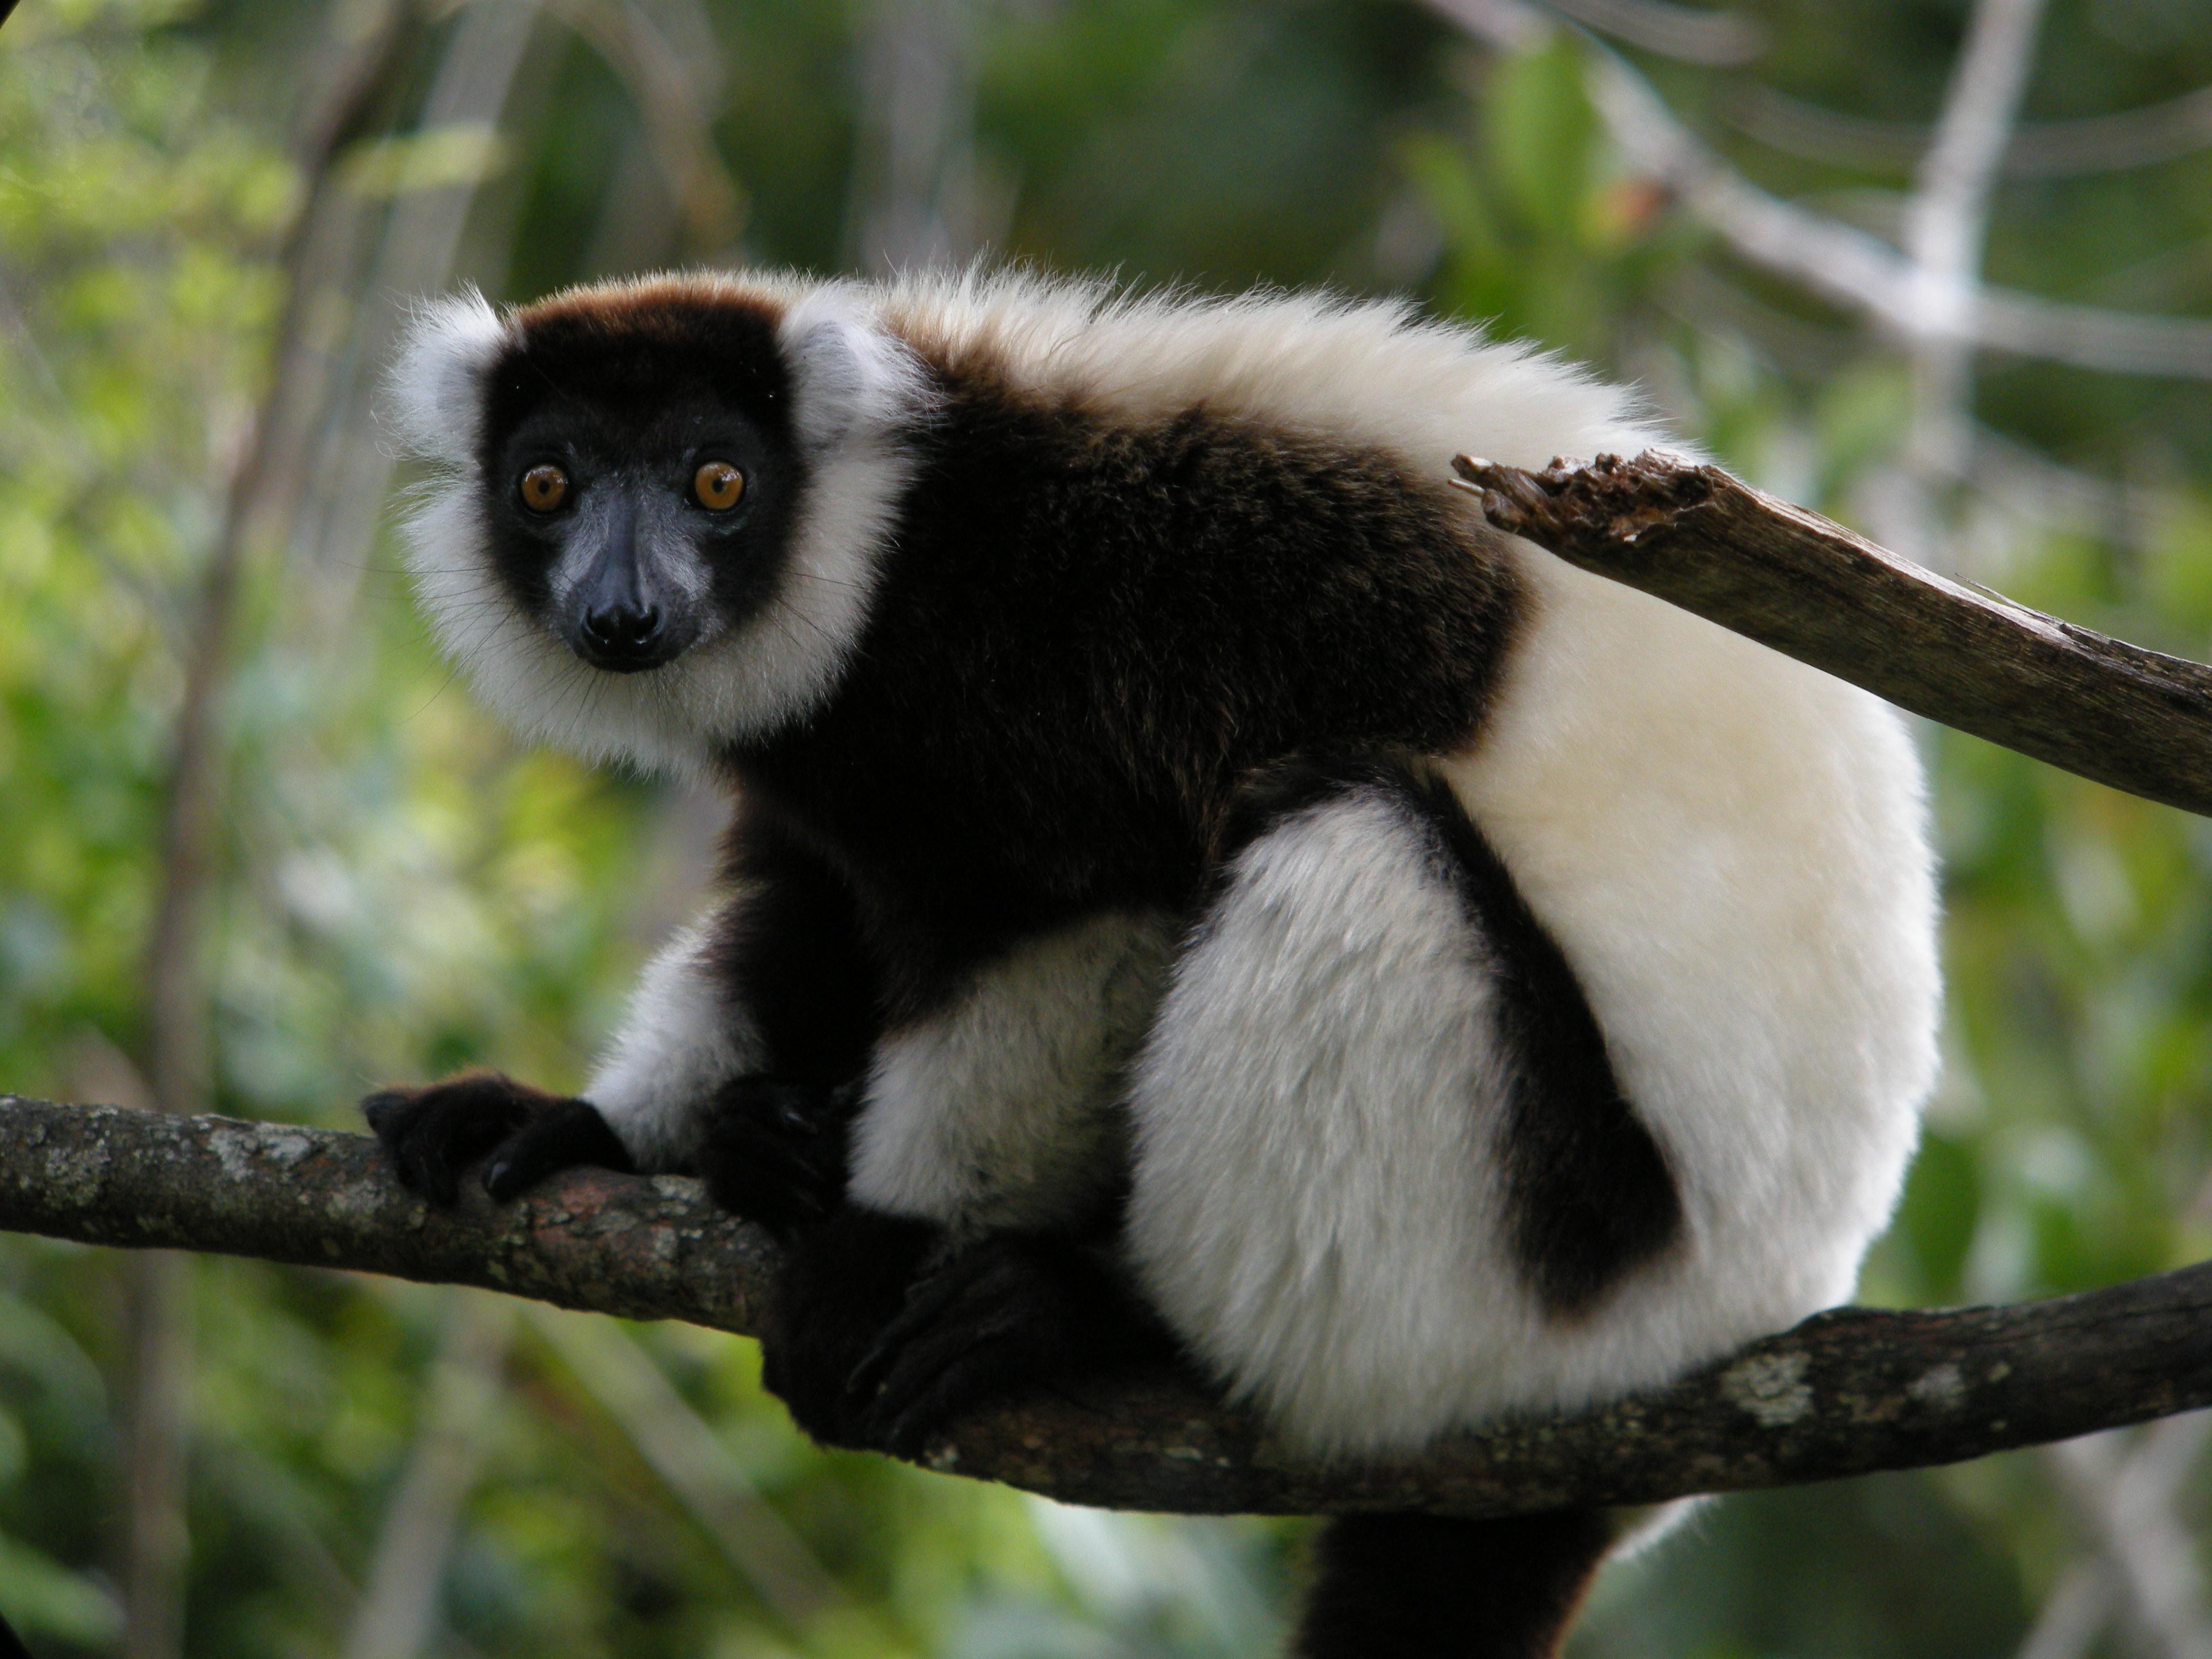 Suzy's Animals of the World Blog: THE BLACK AND WHITE RUFFED LEMUR